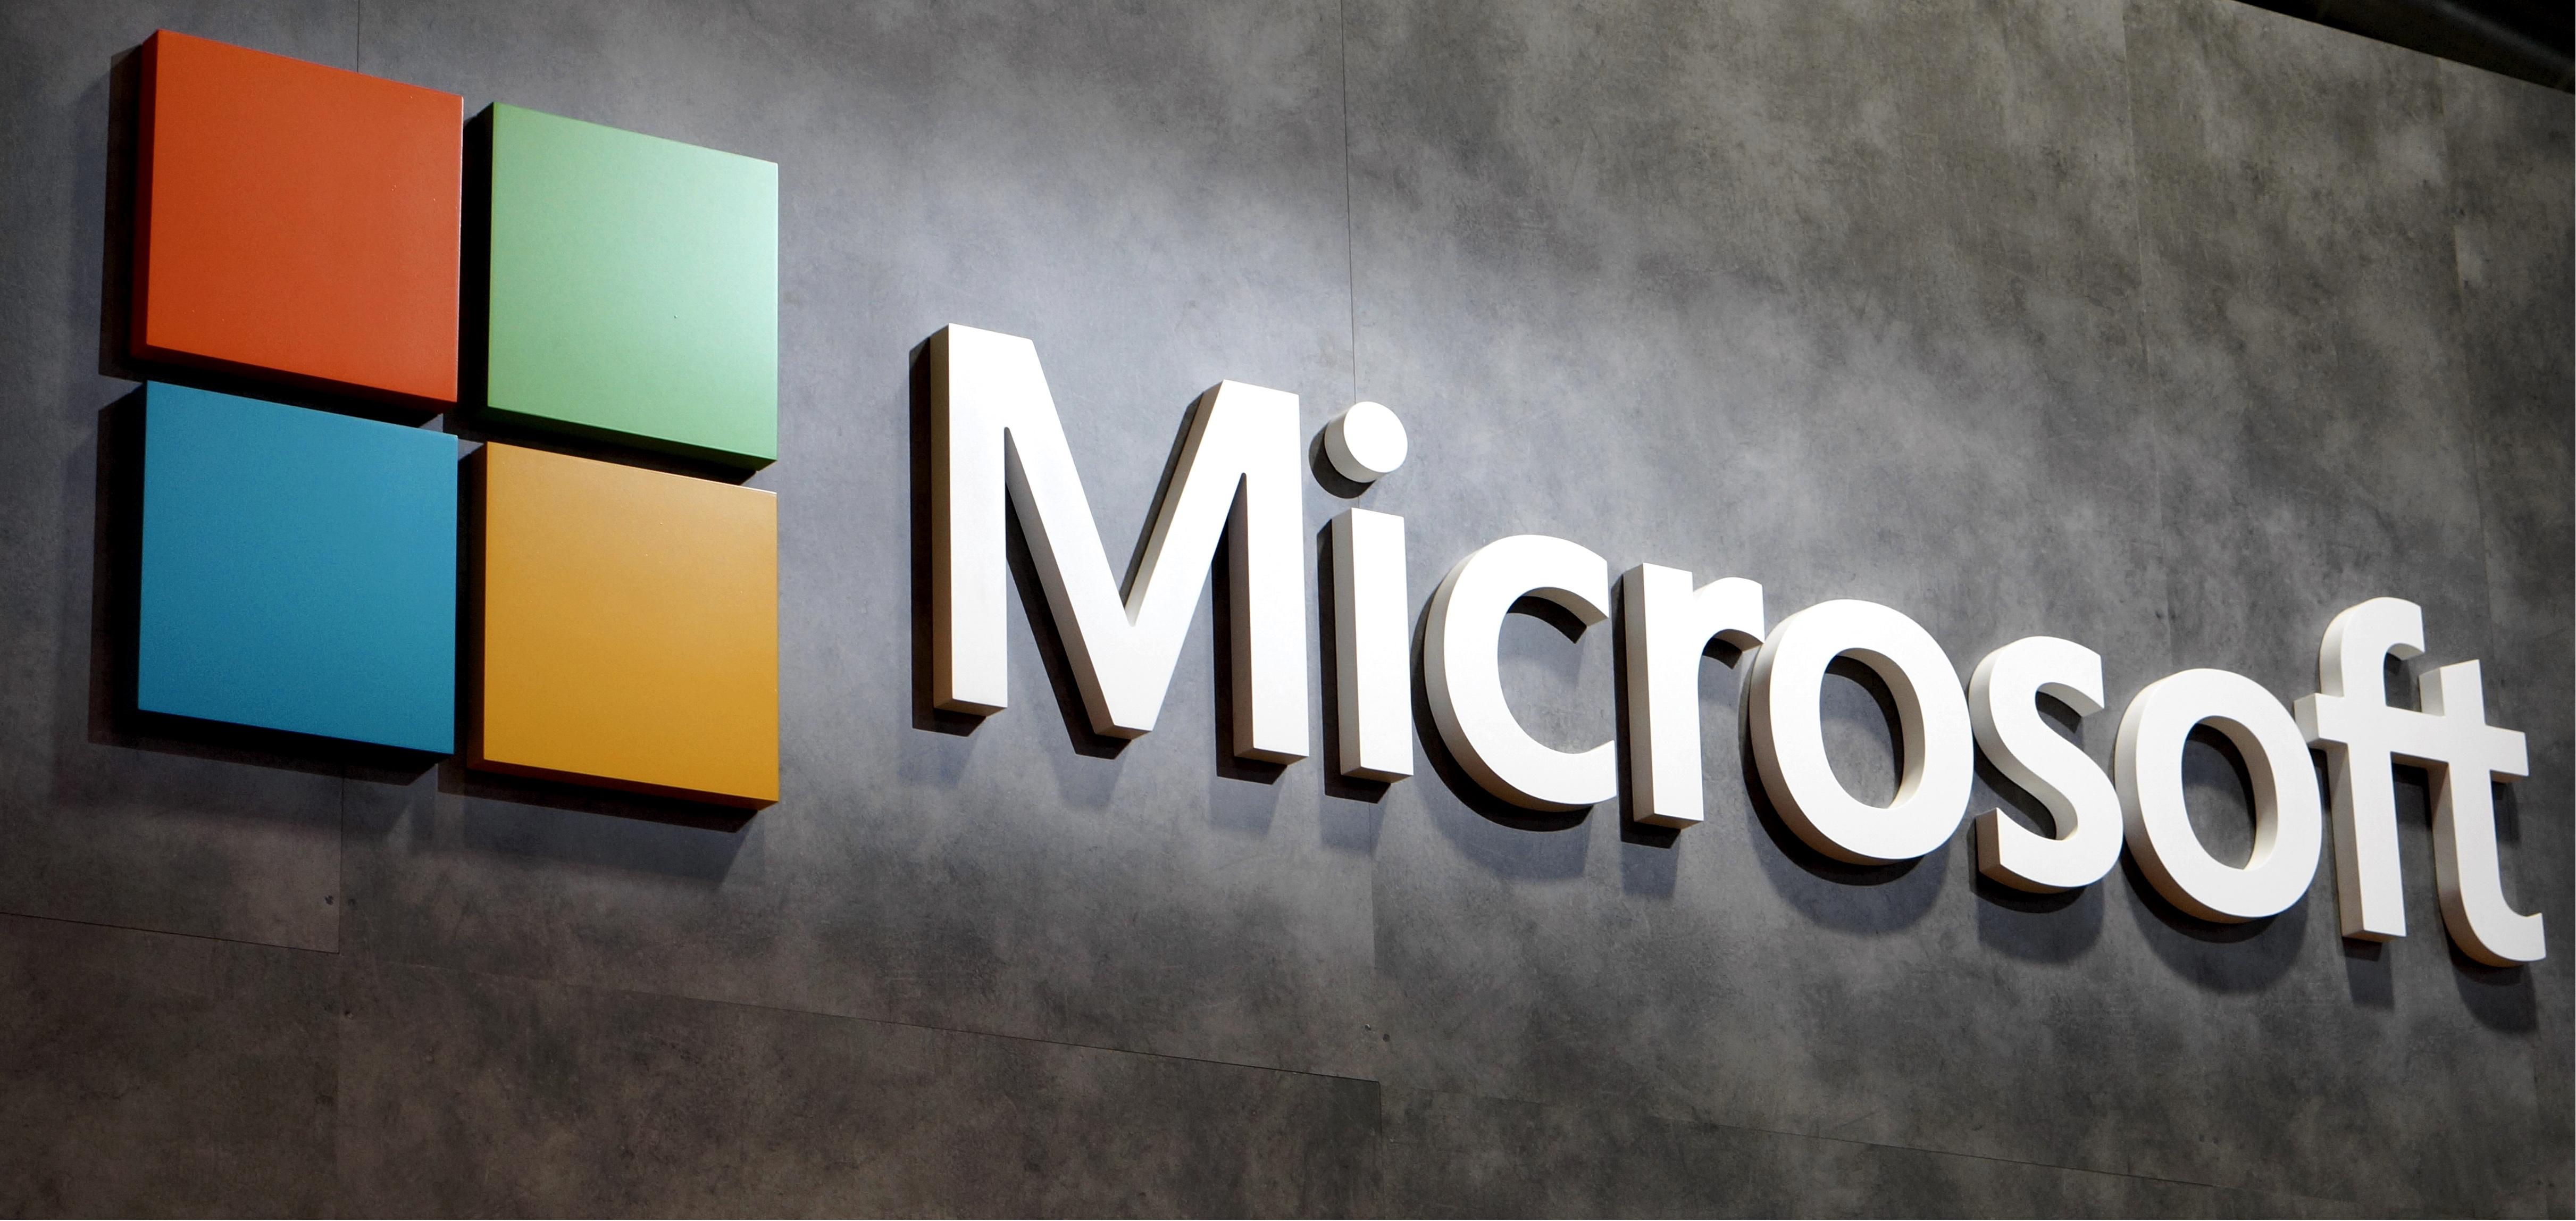 4844x2296 > Microsoft Wallpapers